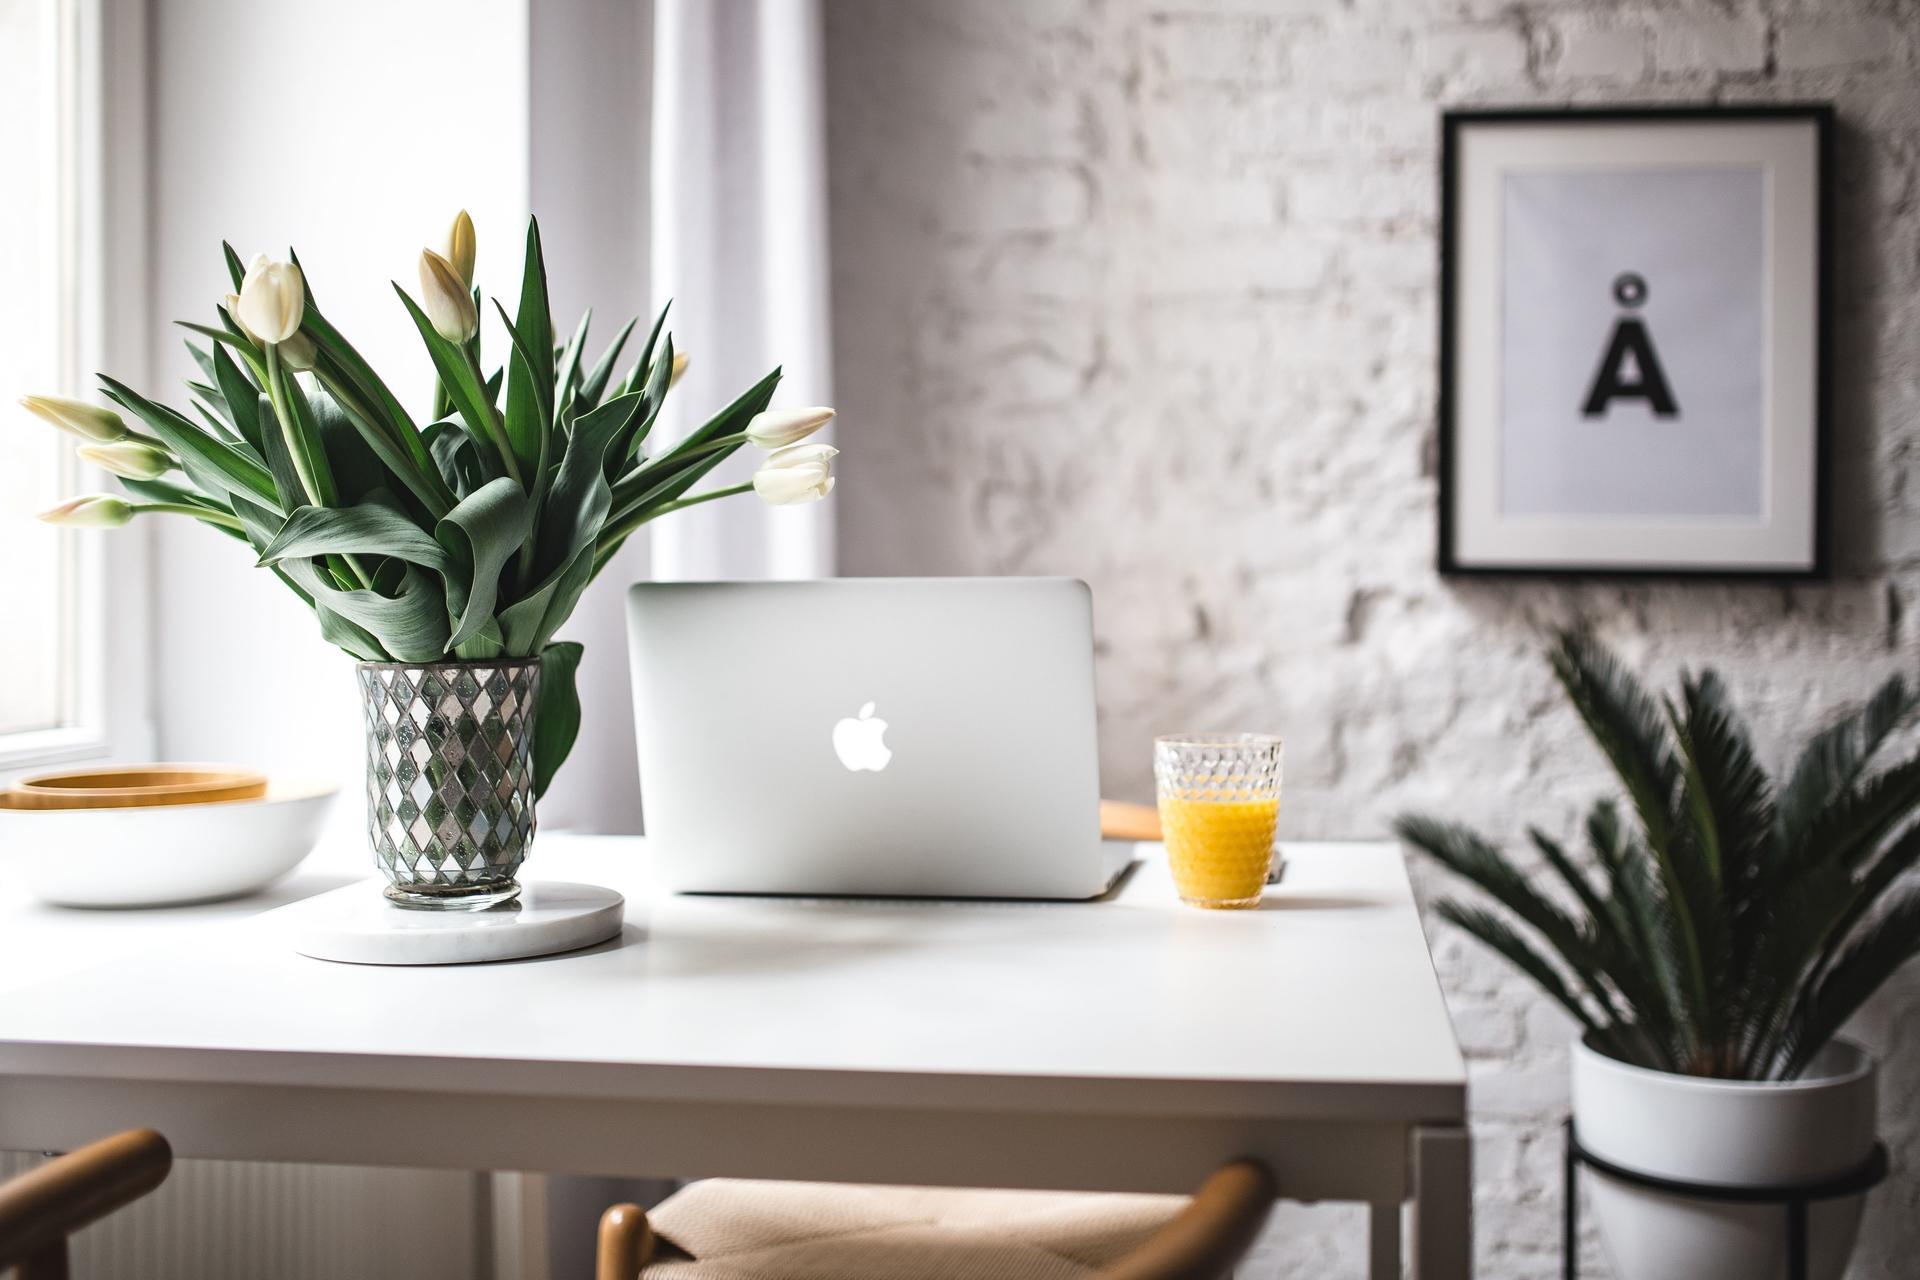 kaboompics_Stylish workspace with Macbook Pro.jpg